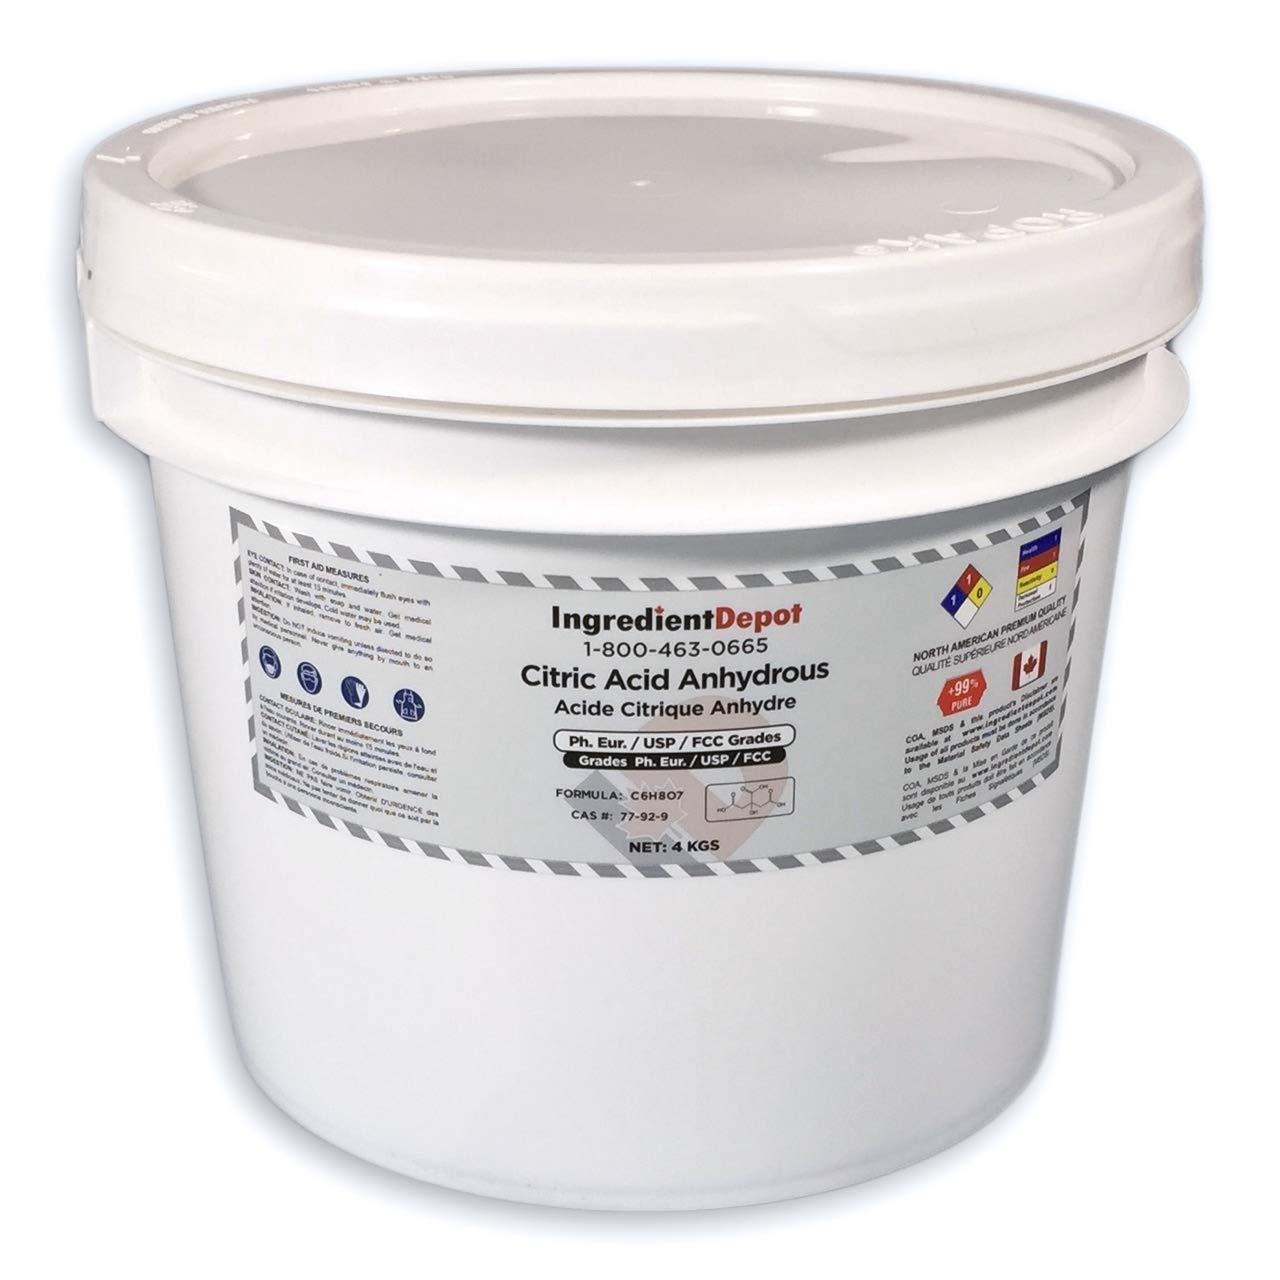 Citric Acid Anhydrous USP Food Grade | 4 kgs